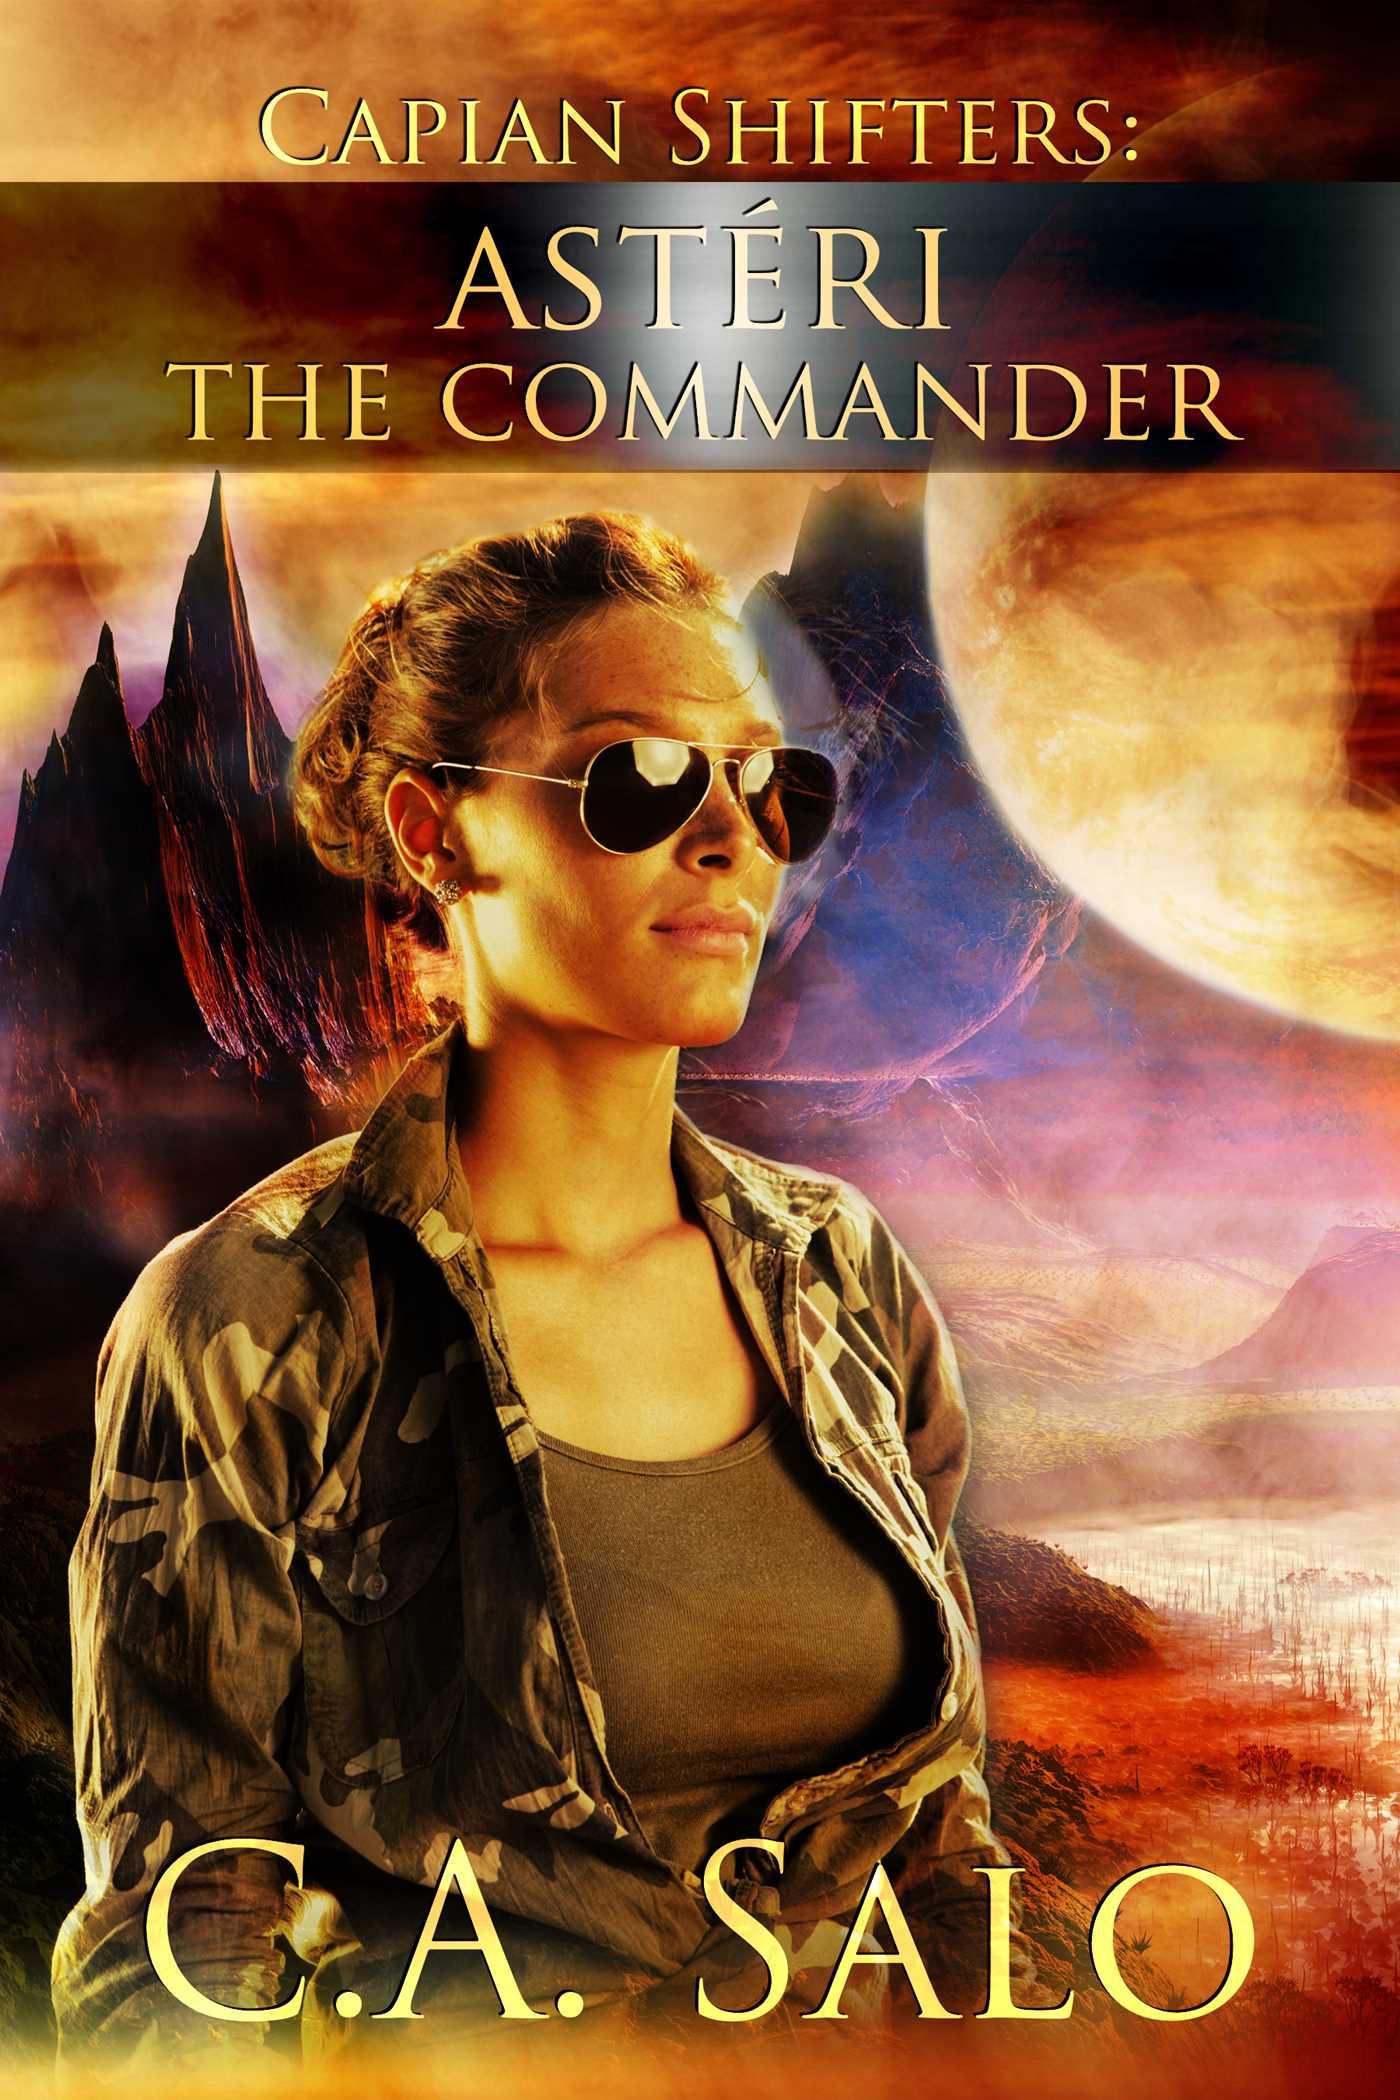 Asteri the commander 9781681461298 hr